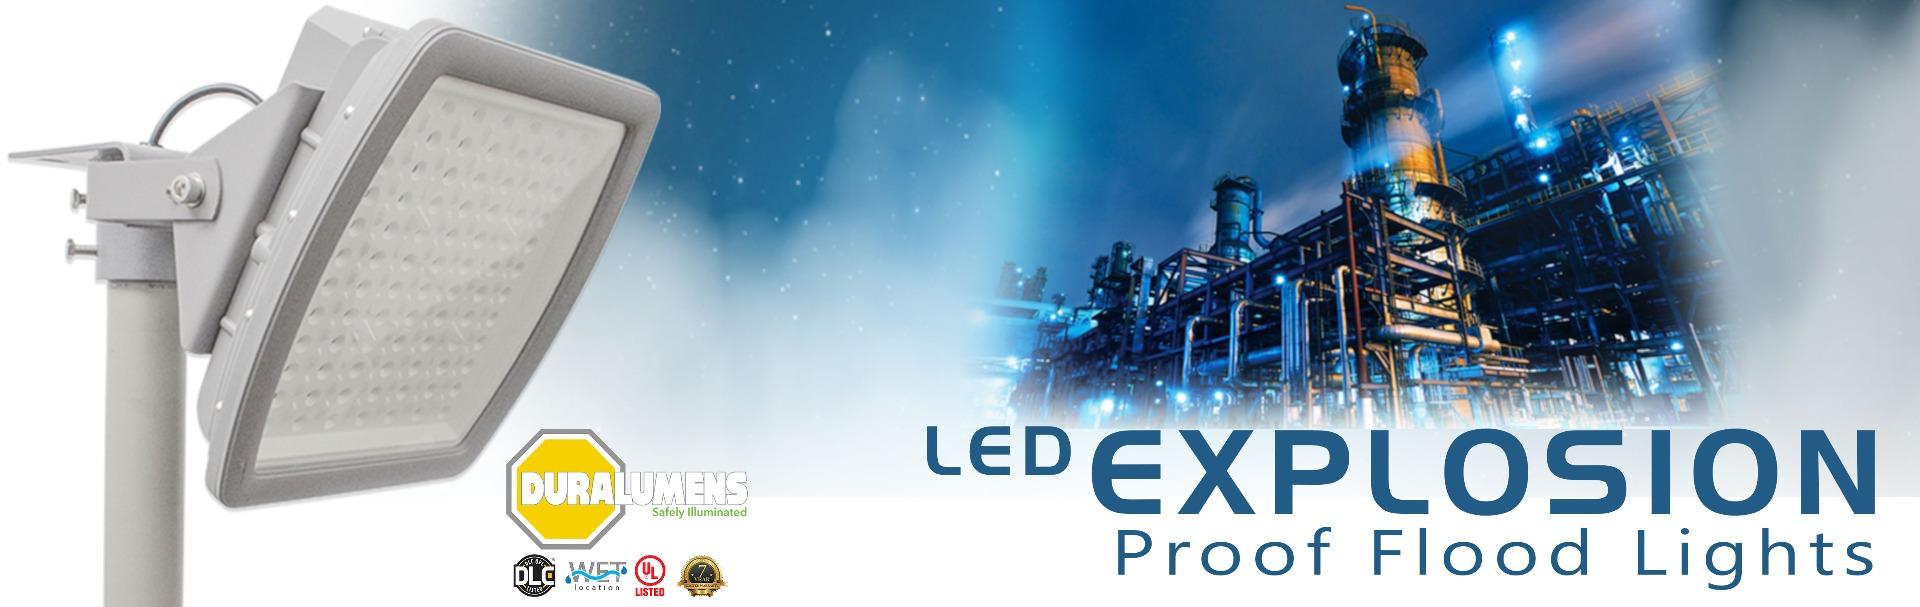 LED Explosion Proof Fixture Class 1, Div 2